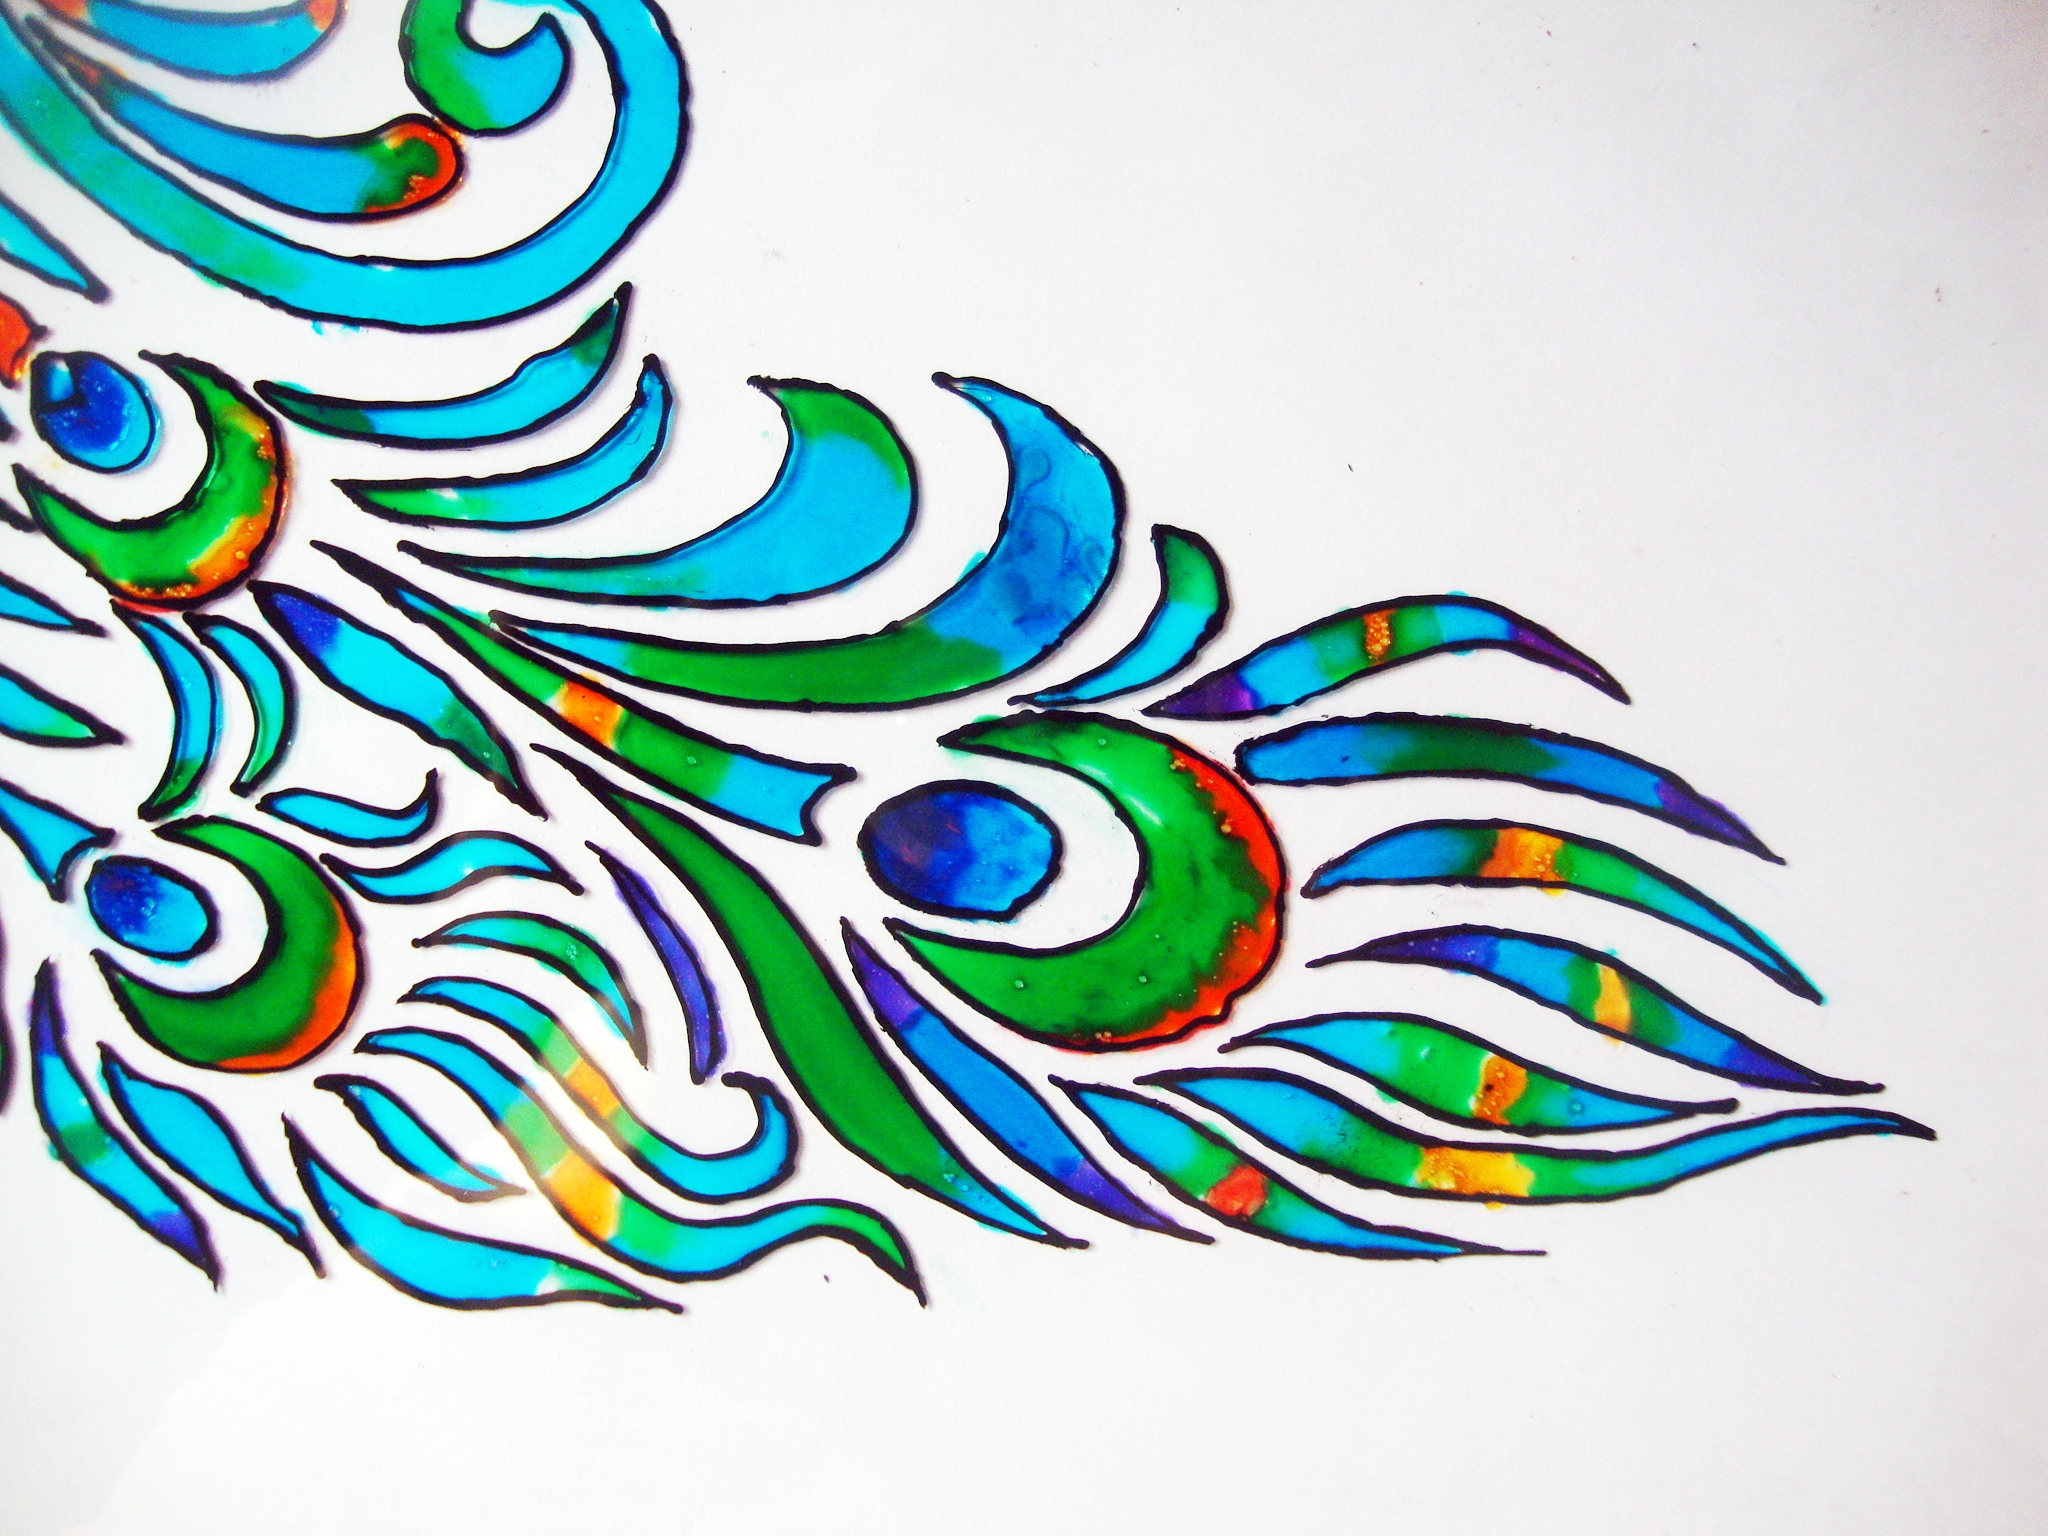 Glass painting tutorial m de by lakshmi for How do i paint glass